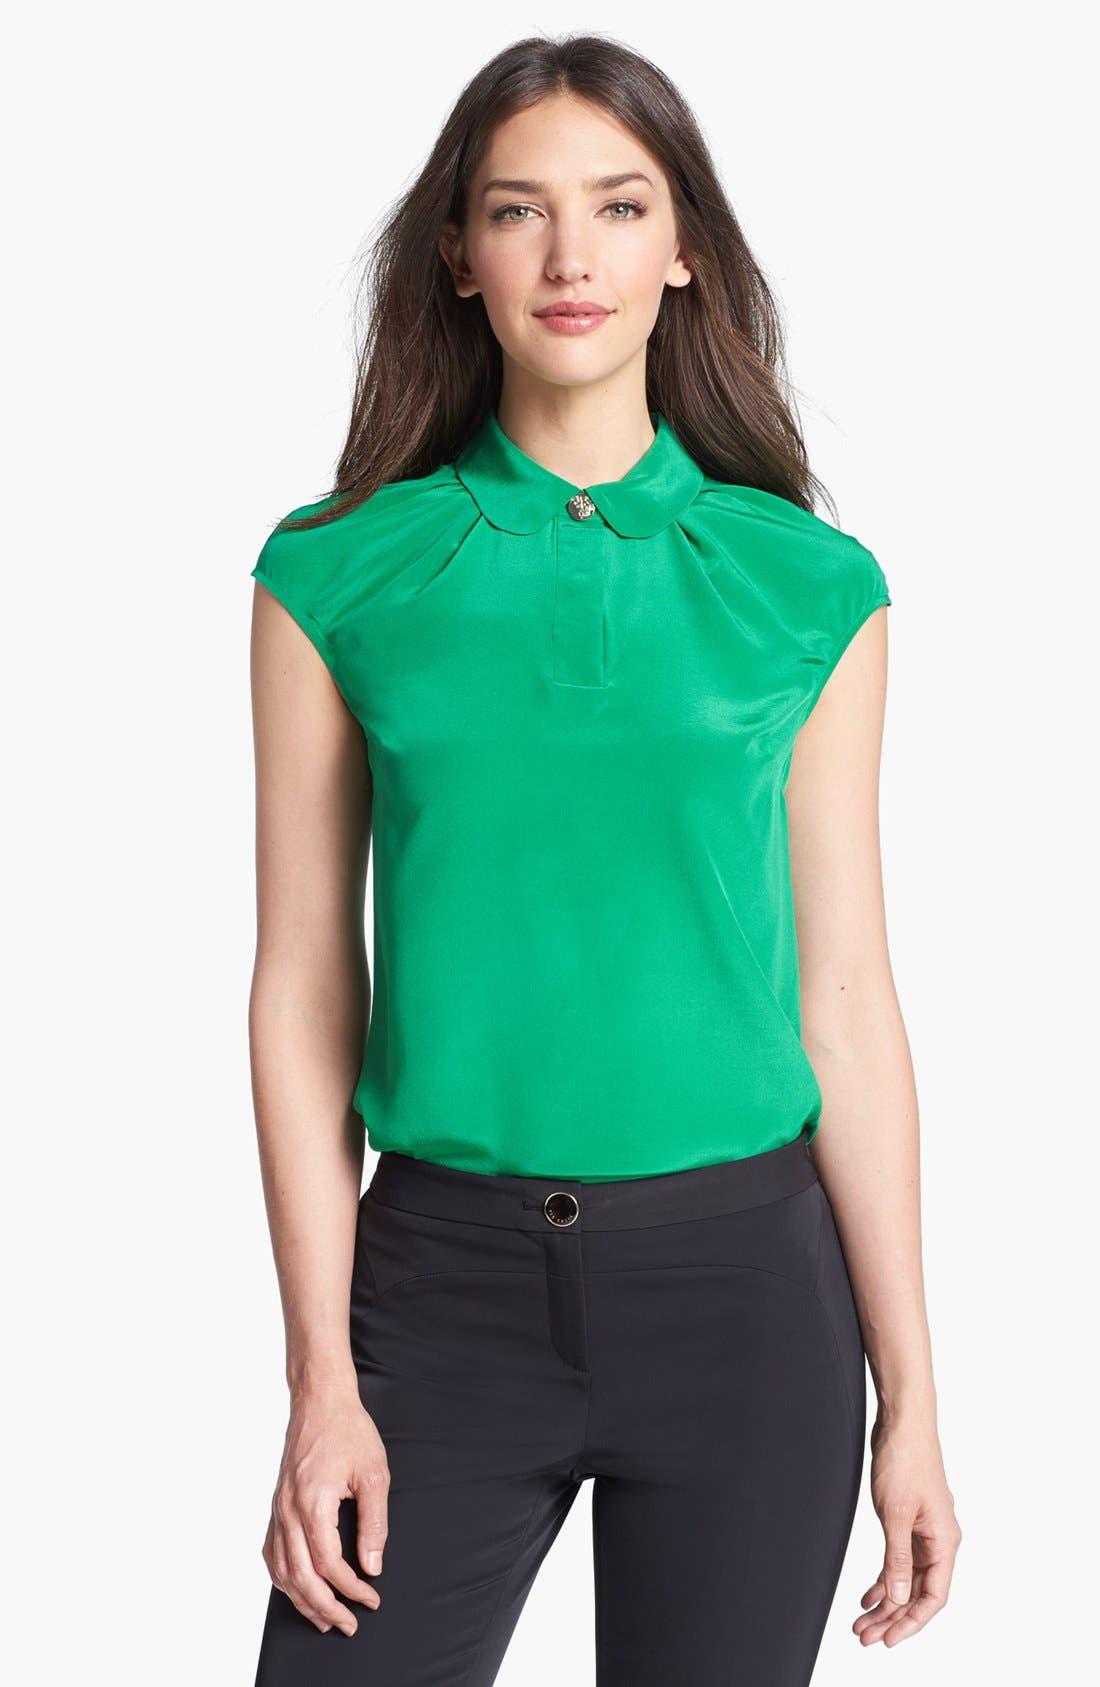 Alternate Image 1 Selected - Ted Baker London Peter Pan Collar Silk Top